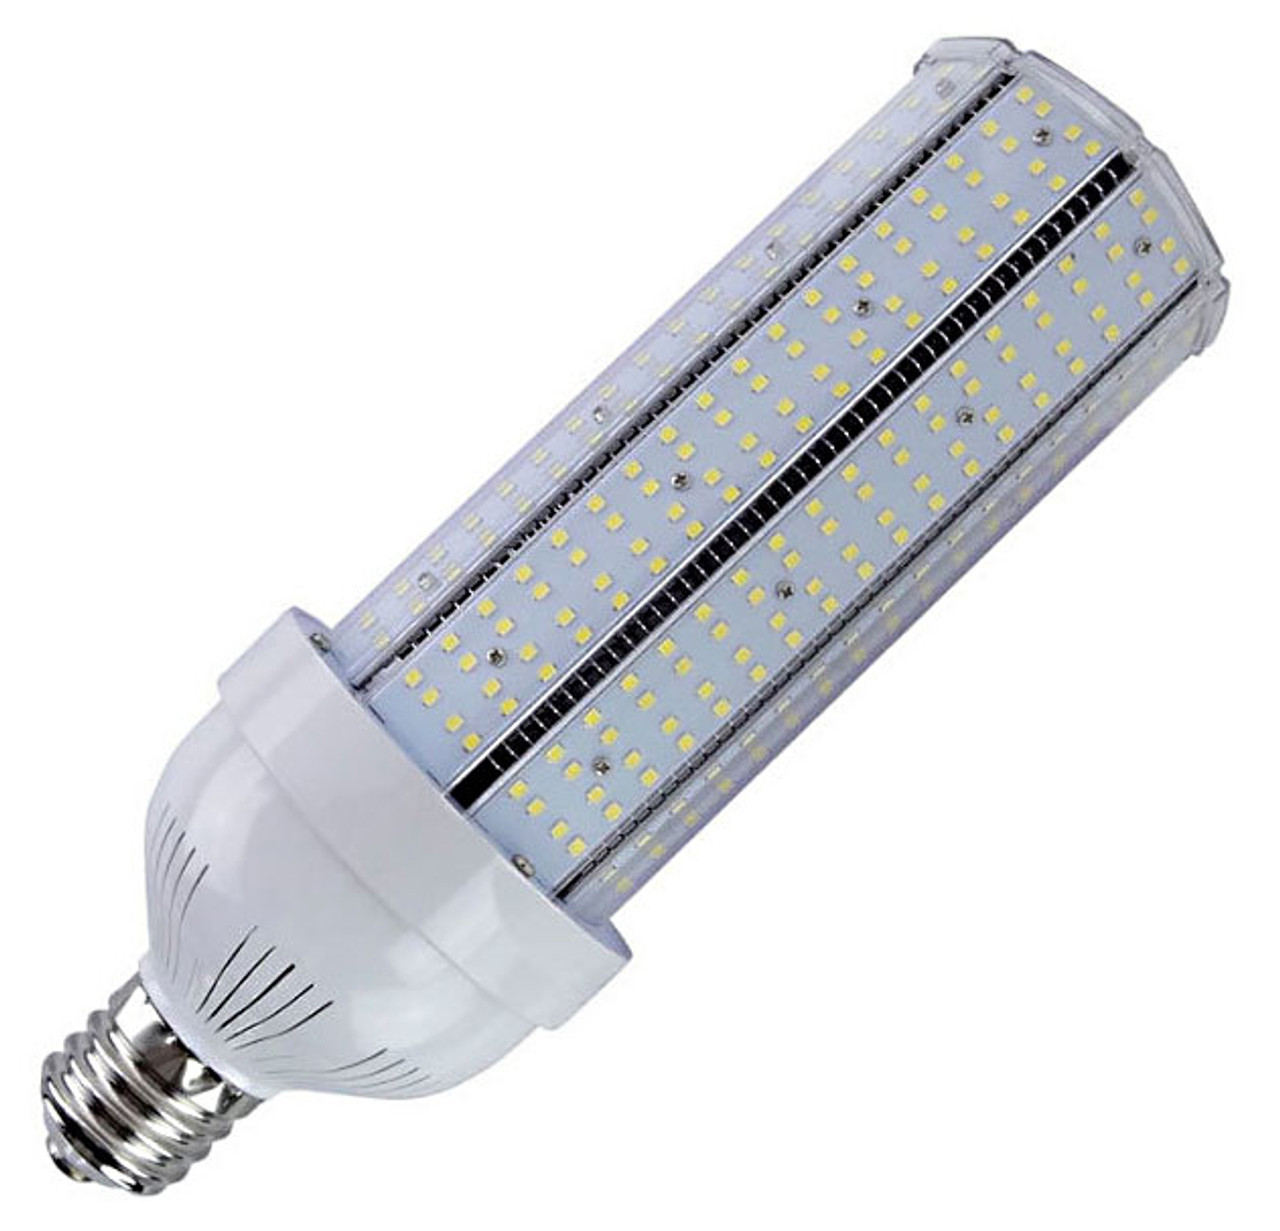 400-450 Watt LED HID Retrofit Corn Bulb Replace Halide and High Pressure  Sodium Lamps